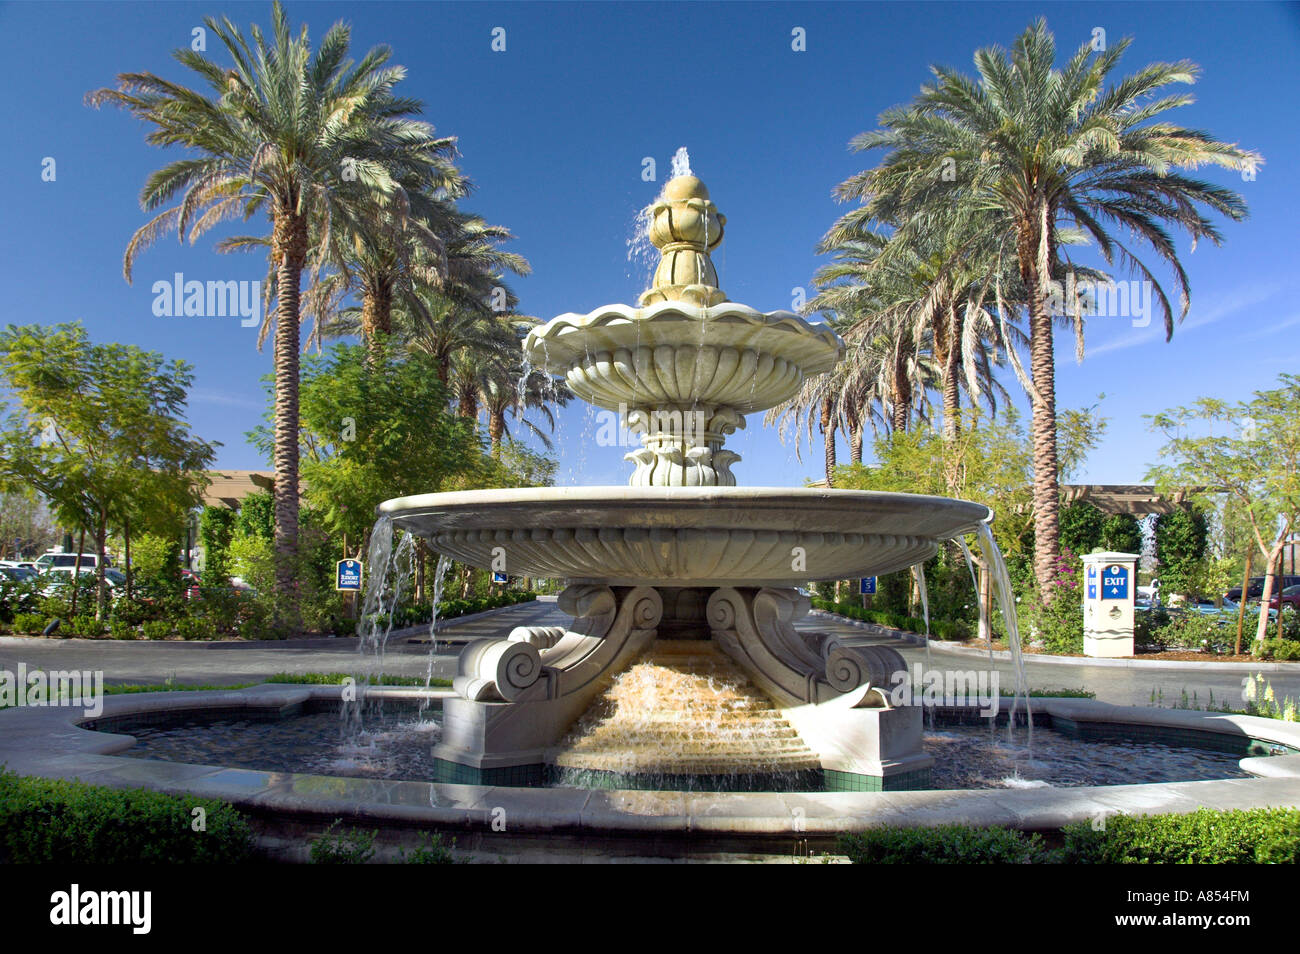 Spa resort casino spa no deposit bingo free money